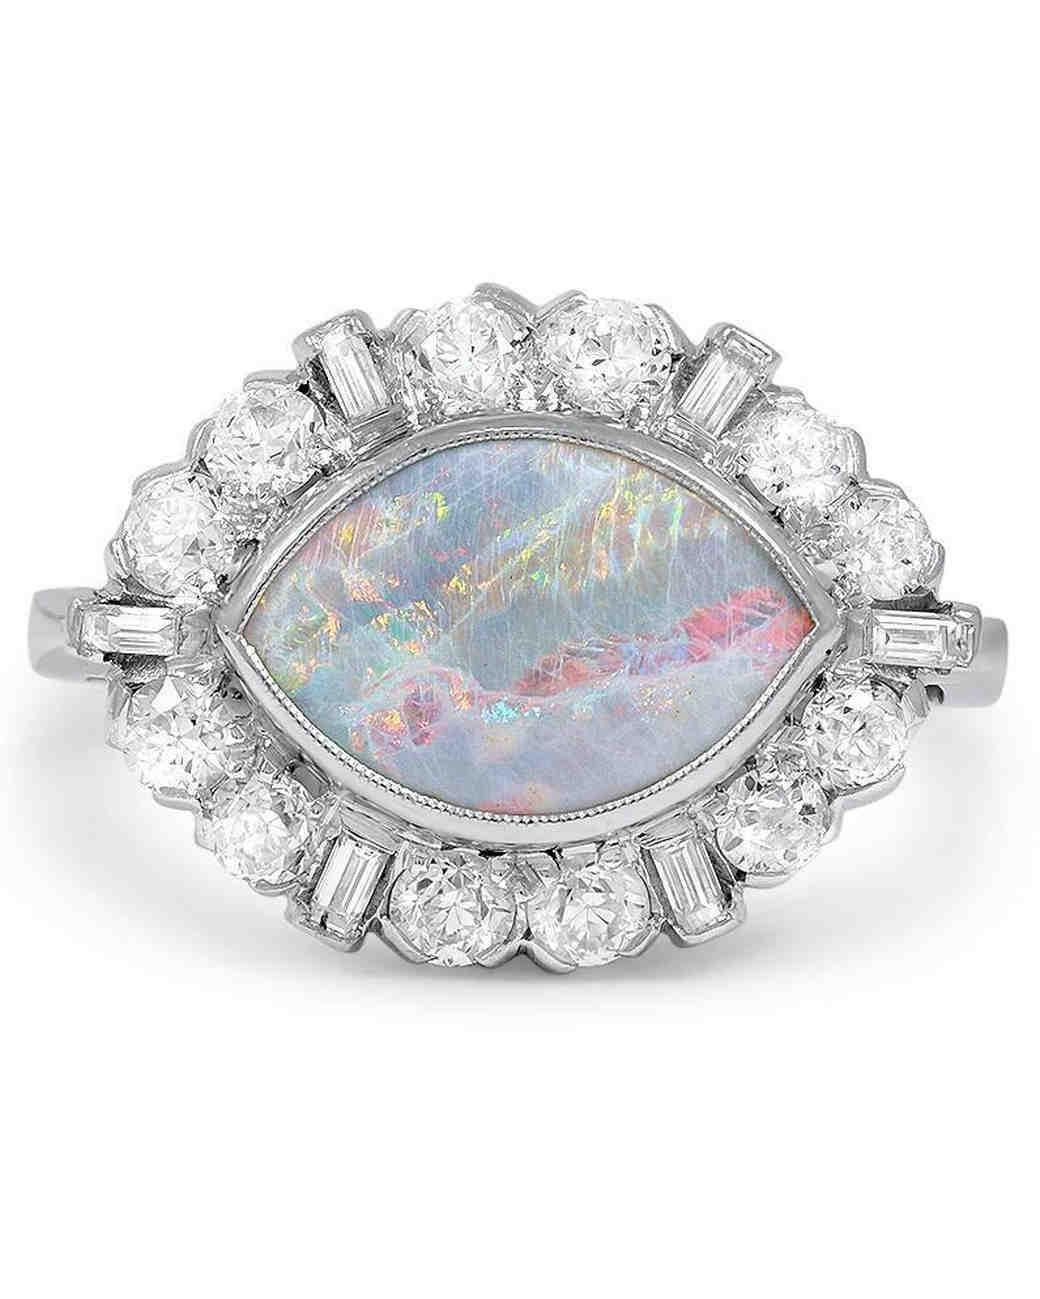 opal engagement rings that are oh so dreamy martha stewart weddings - Opal Wedding Ring